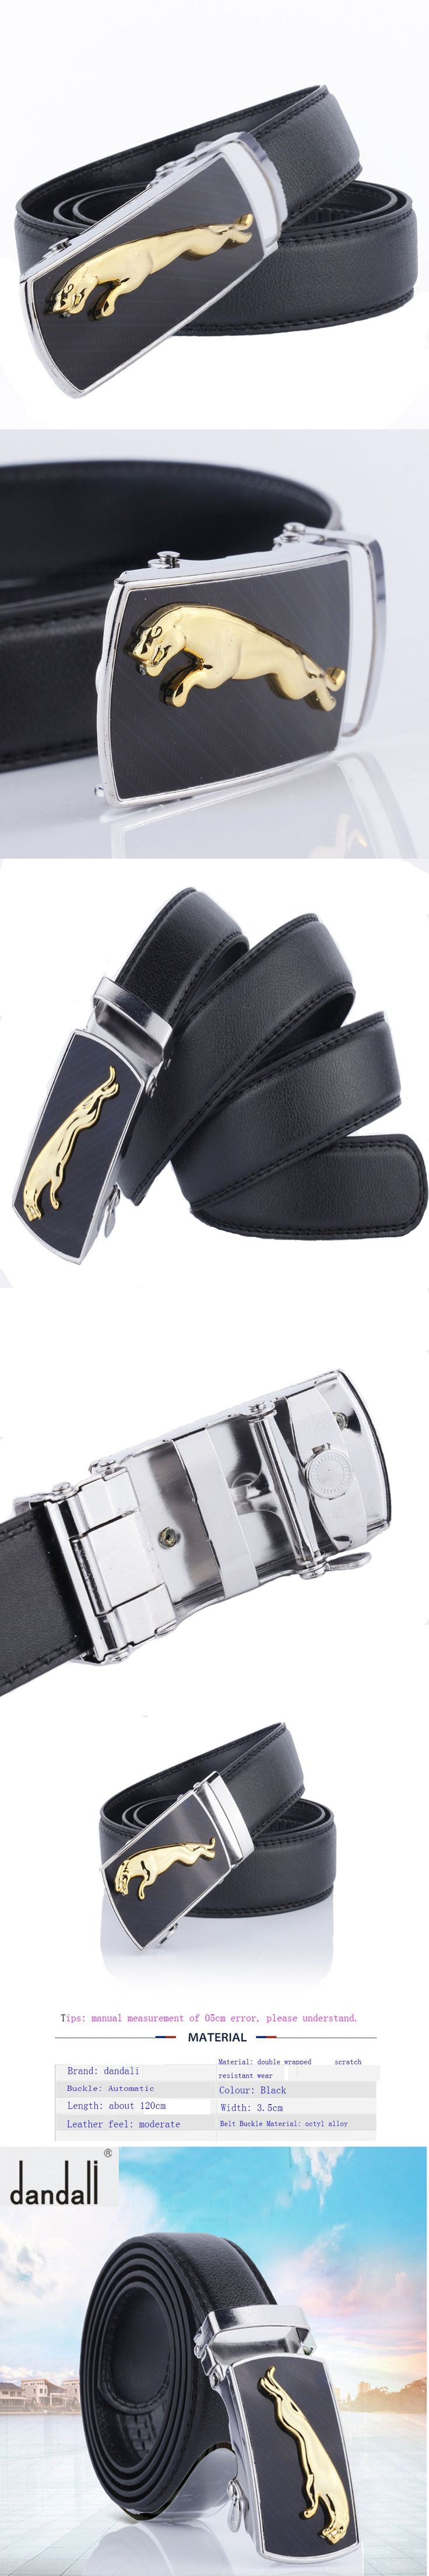 New Waist Leather Feragamo Automatic Belt Buckle For Cinto Strap Cinturon PU Cintura Prestigio Cinta Kemerler Ceinture Kemer